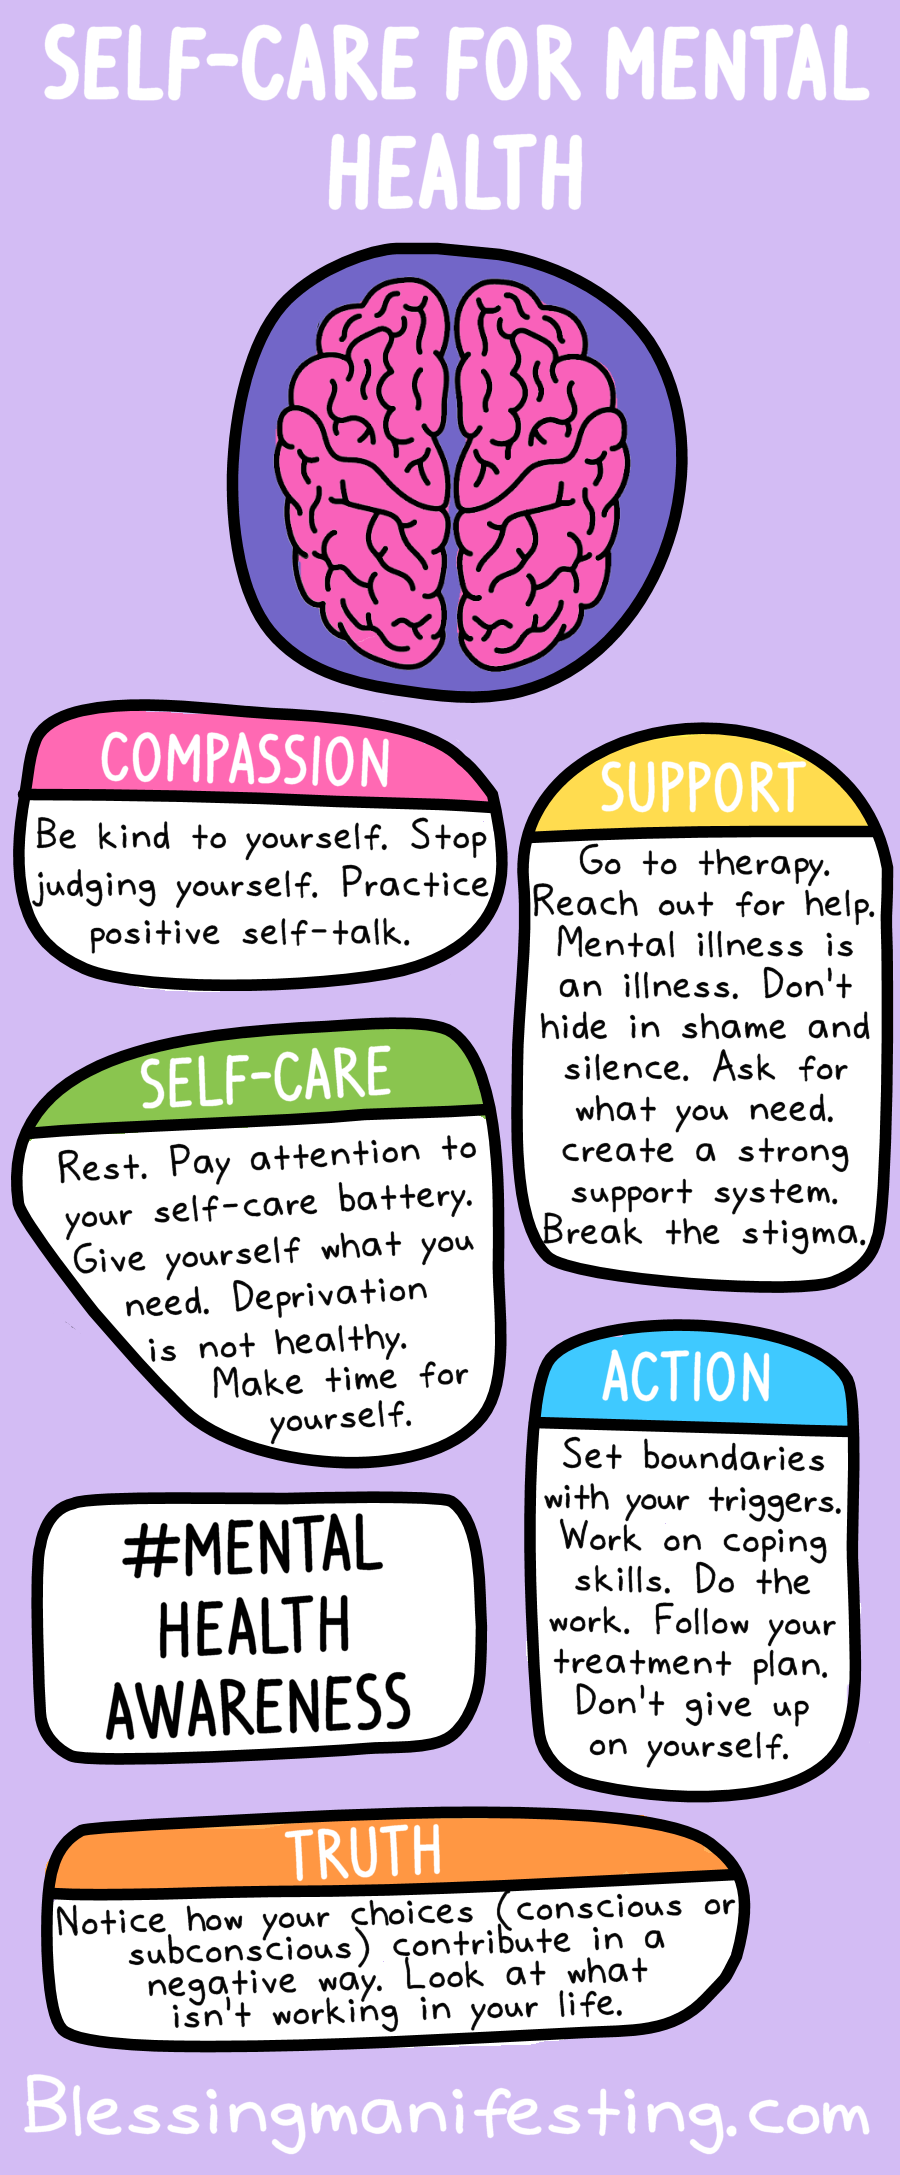 Self-Care for Mental Health - Blessing Manifesting